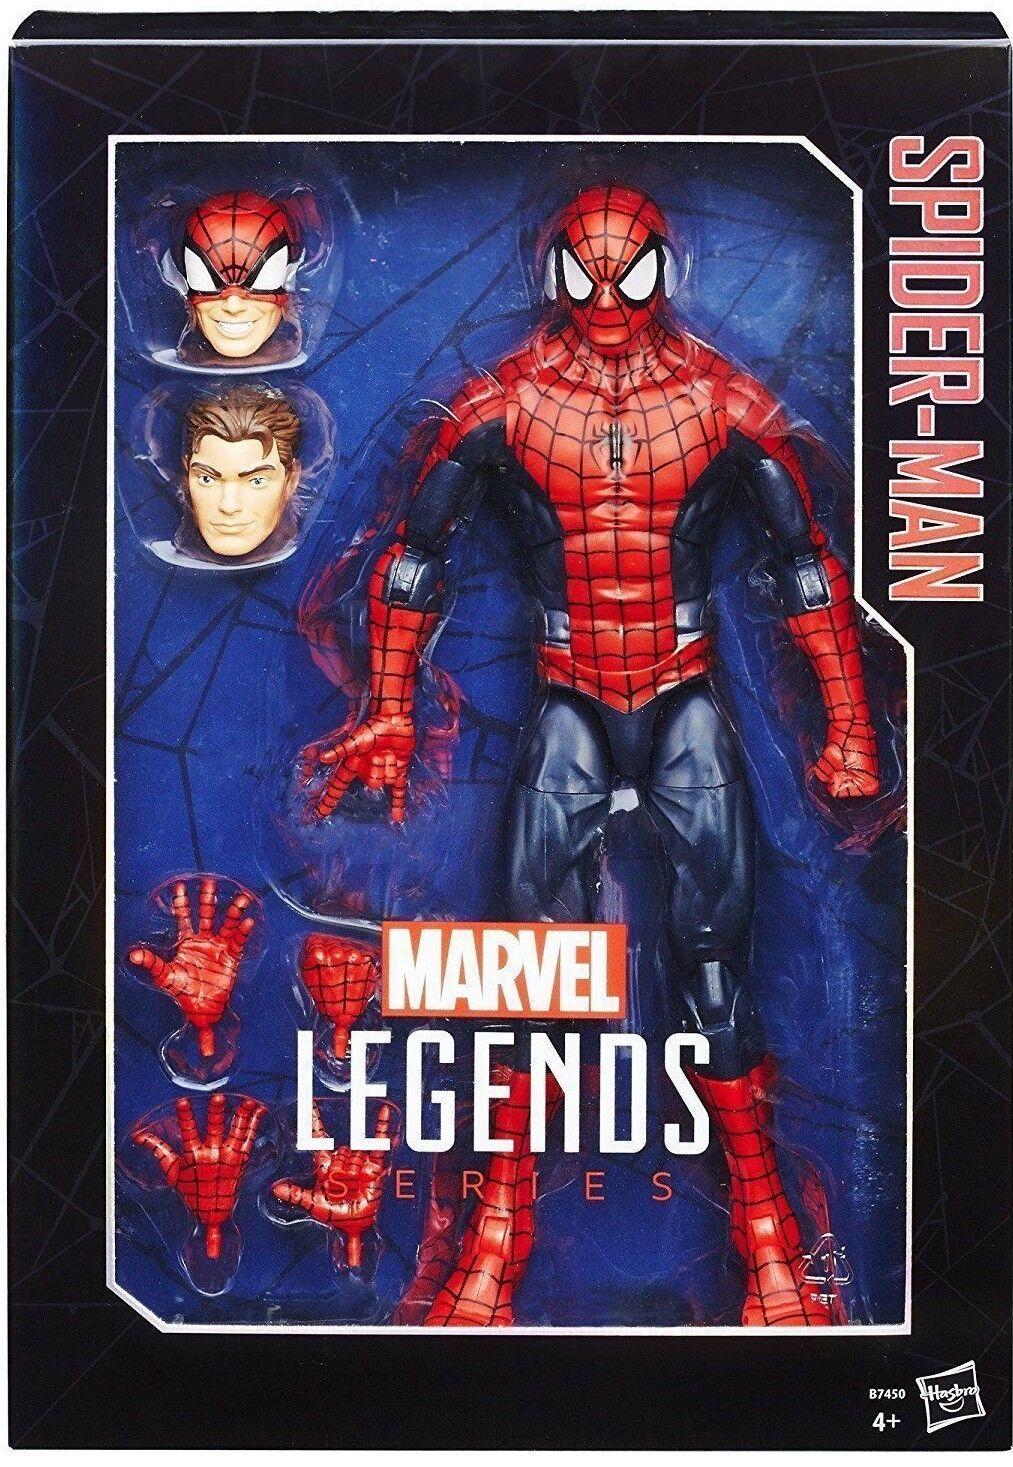 MARVEL LEGENDS Avengers Spiderman 12 inch scaled figure